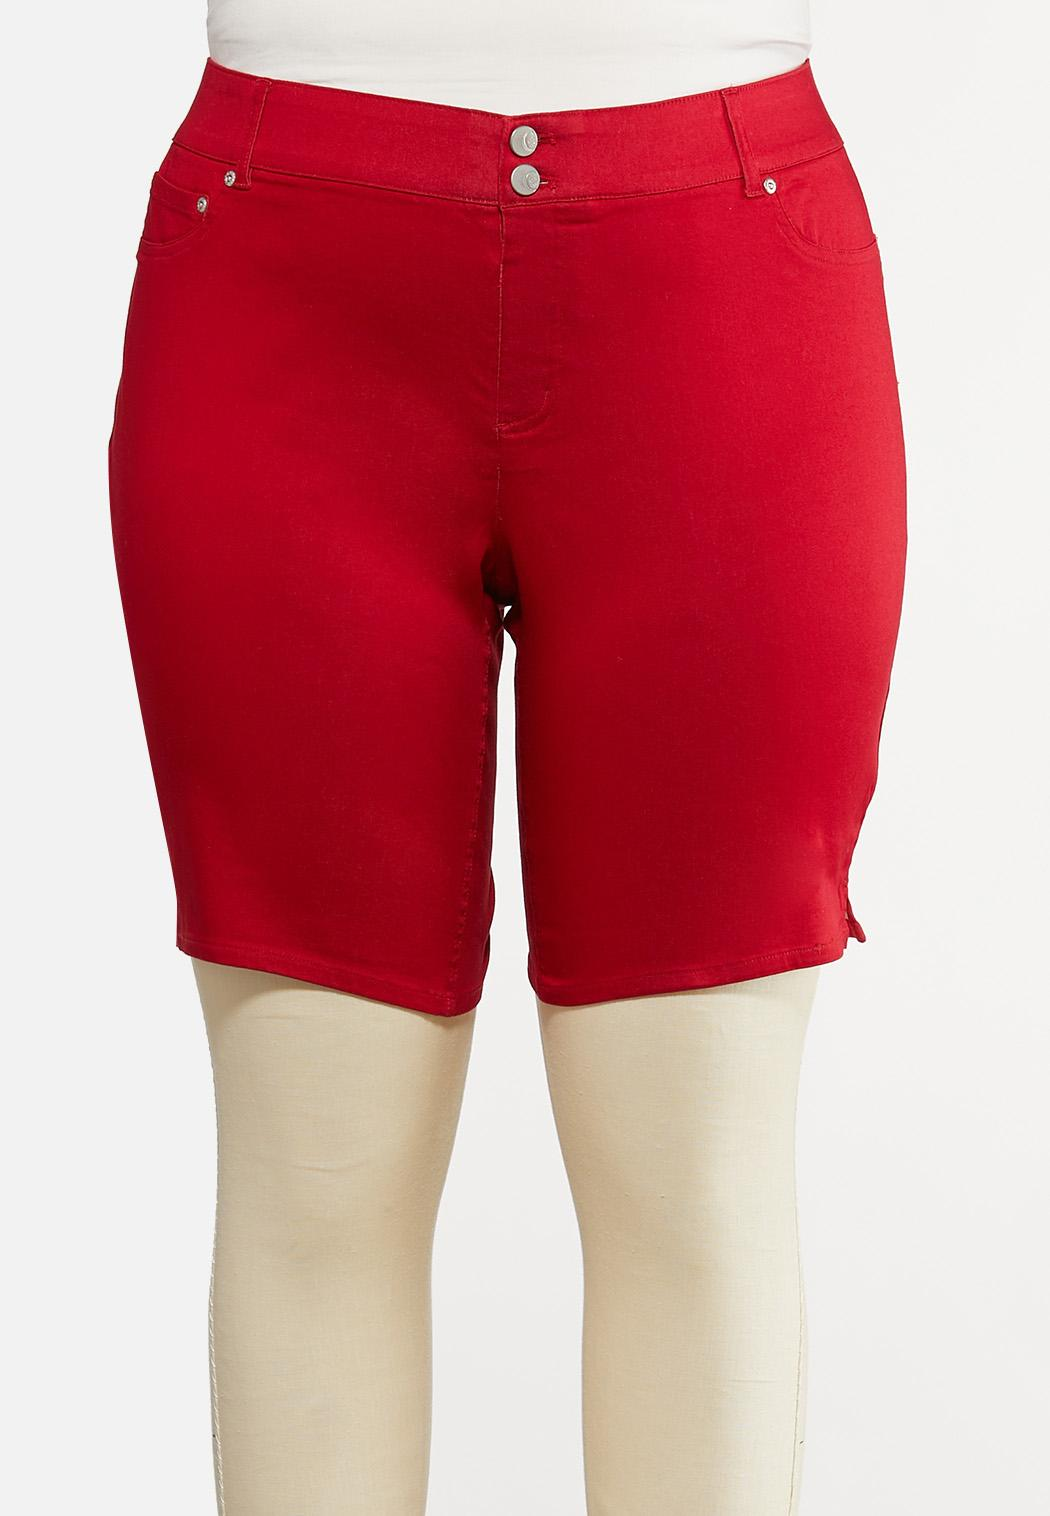 Plus Size Red Curvy Denim Shorts